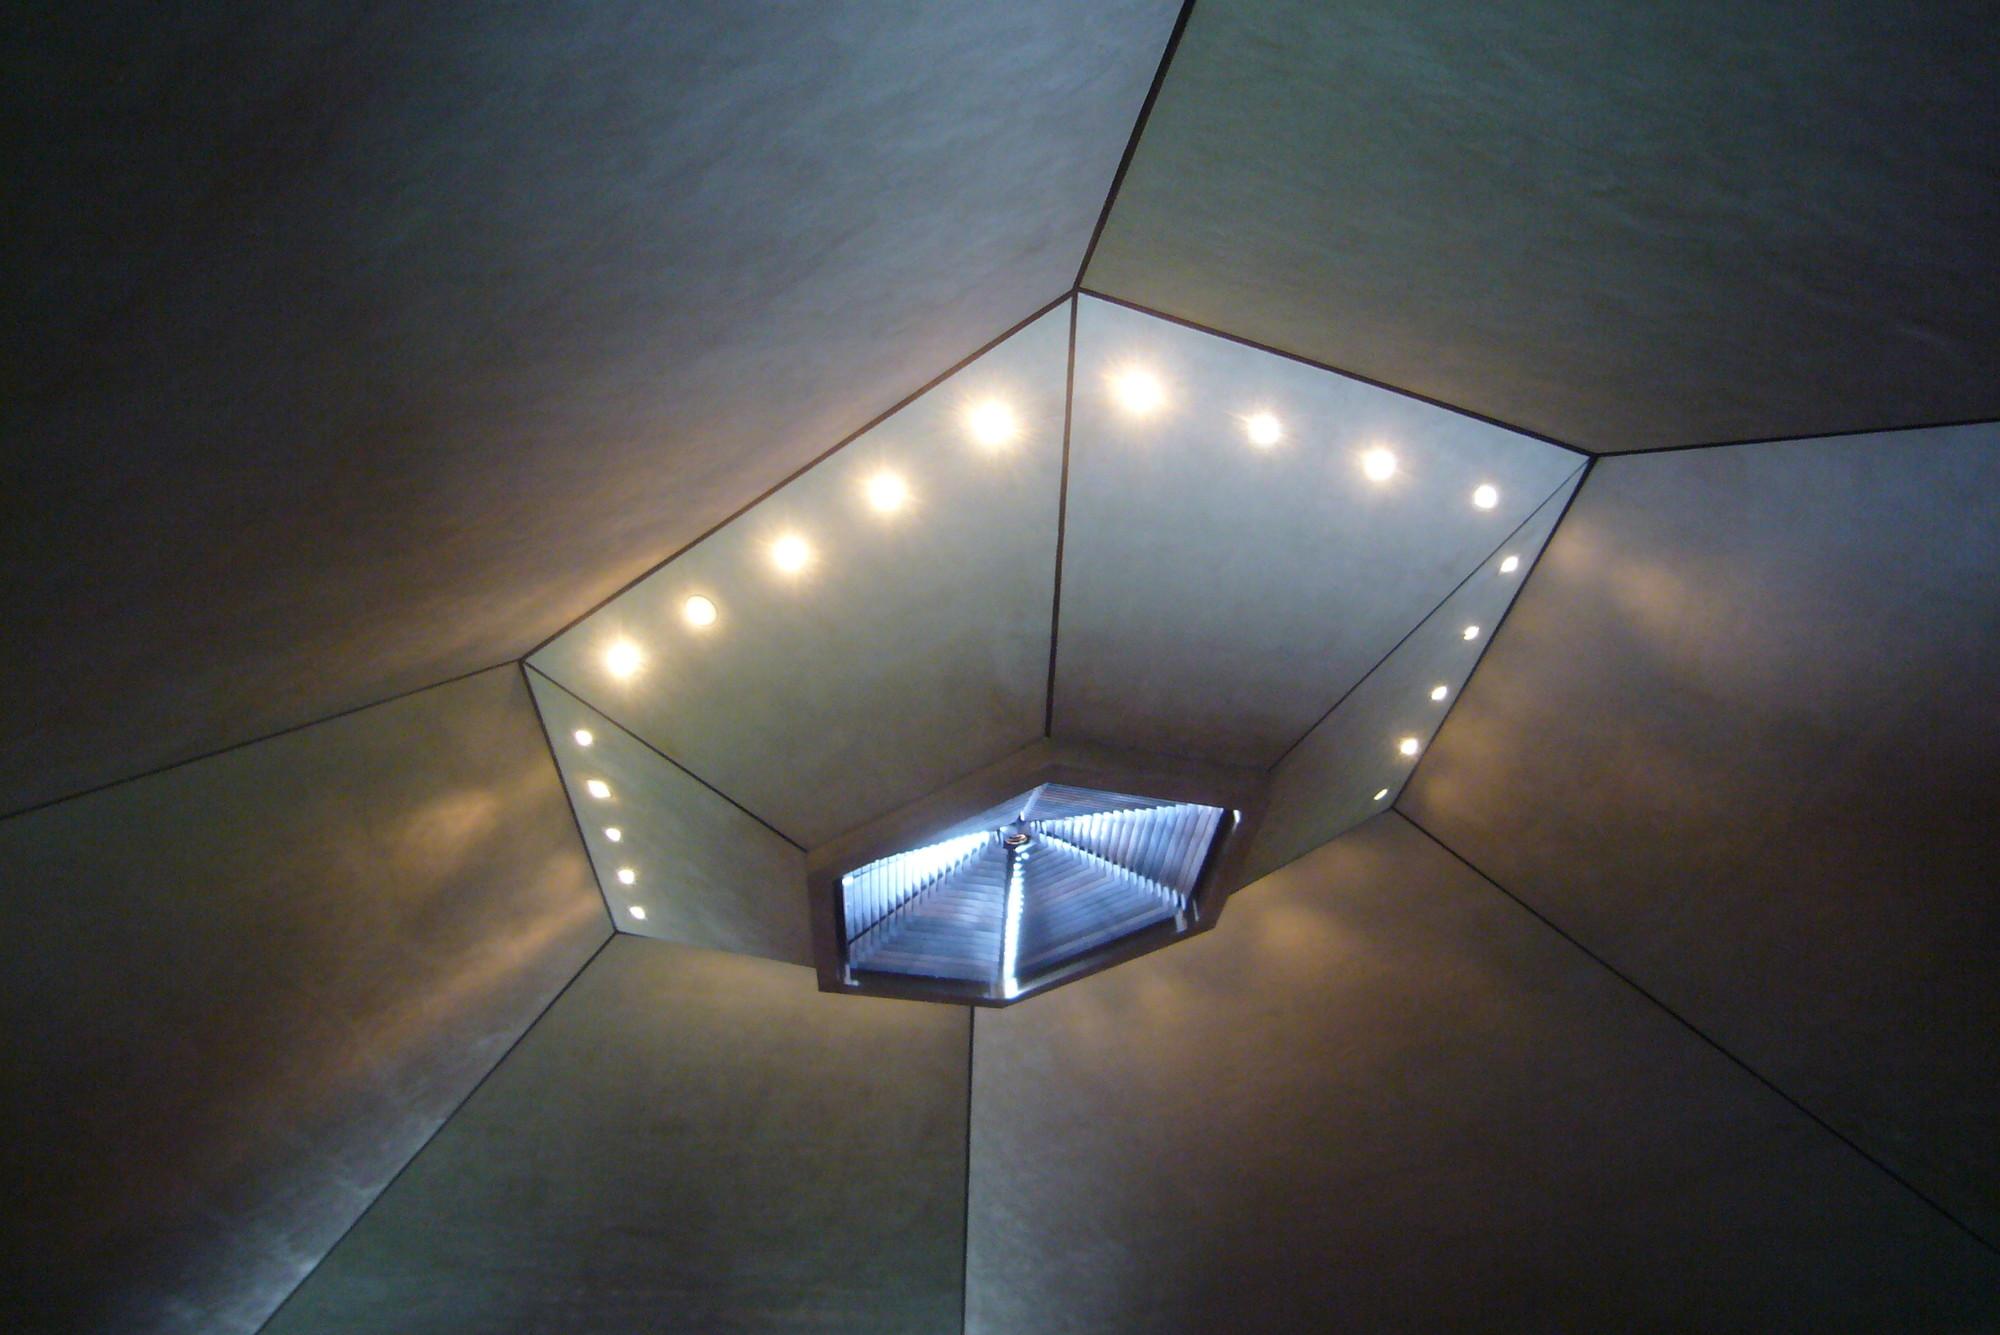 Clásicos de Arquitectura: Iglesia Cristiana del Norte / Eero Saarinen